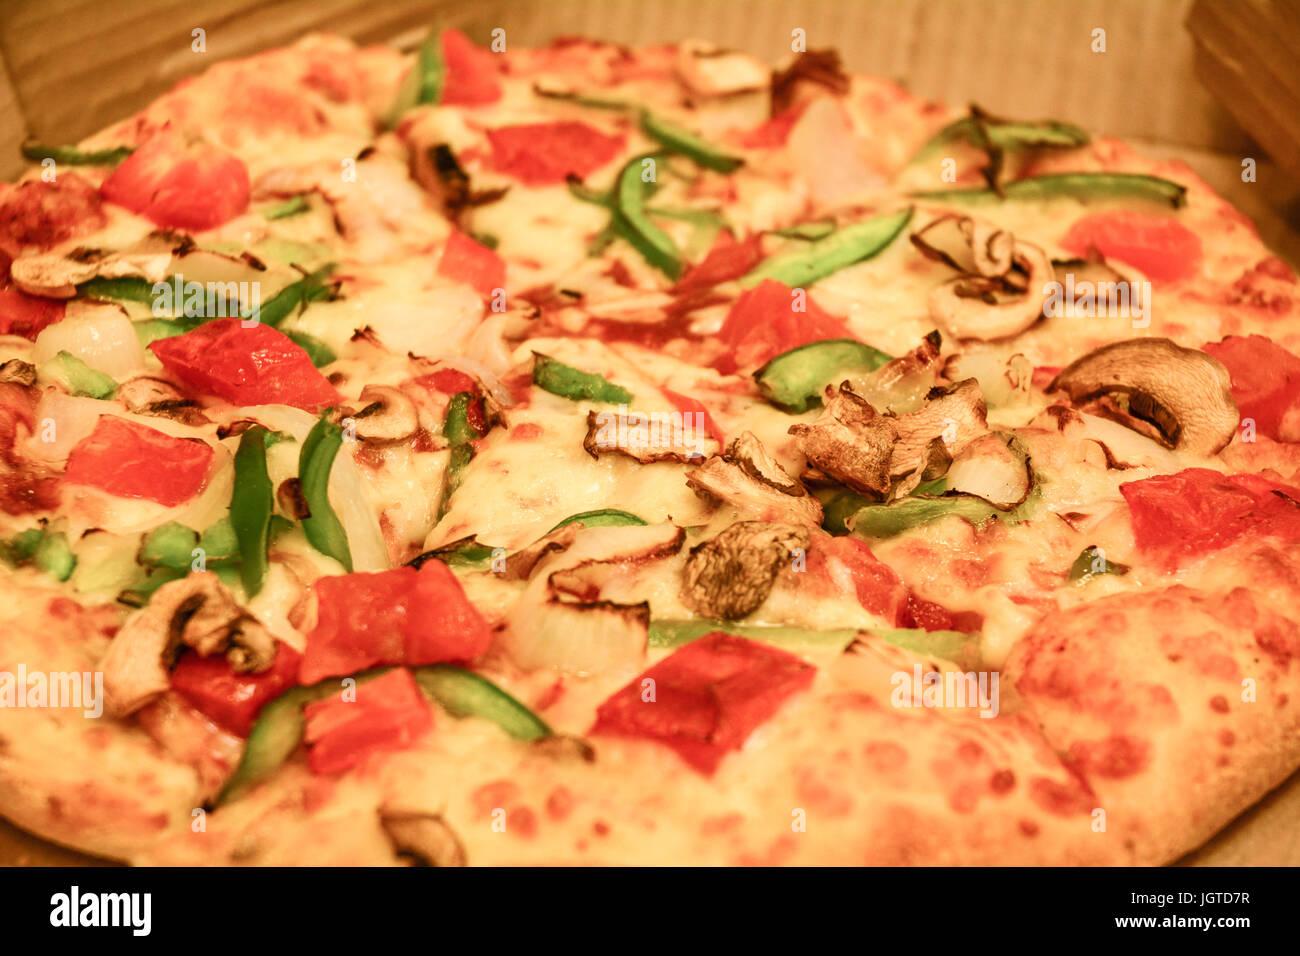 Vegetable Pizza For Dinner At Italian Restaurant Close Up